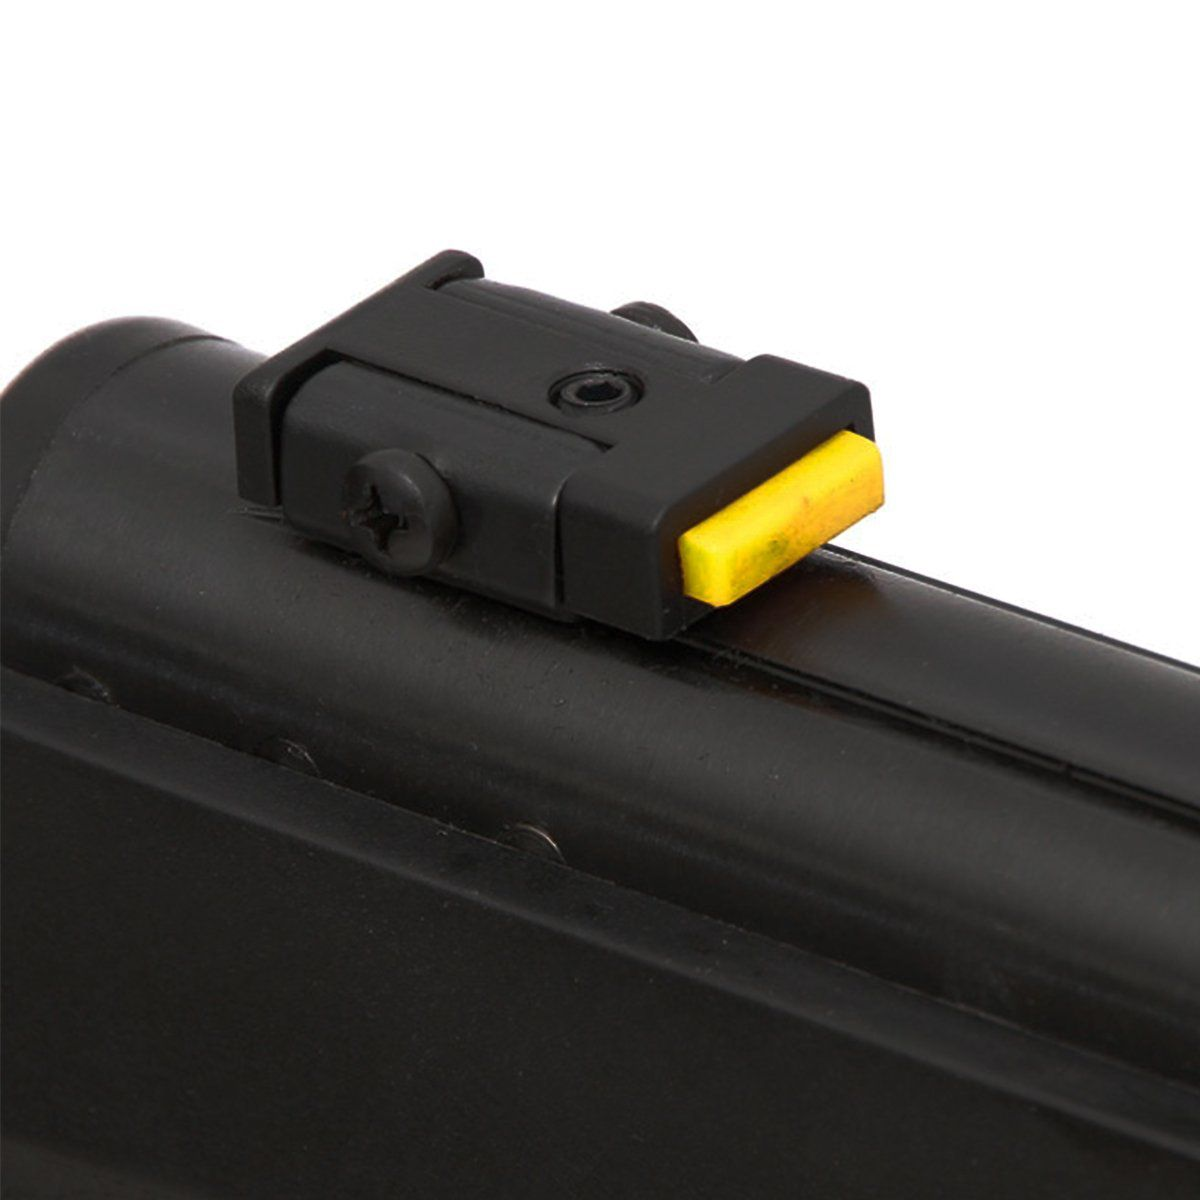 Carabina De Pressão Rossi SAG R1000 Metal Gás Ram 5,5mm